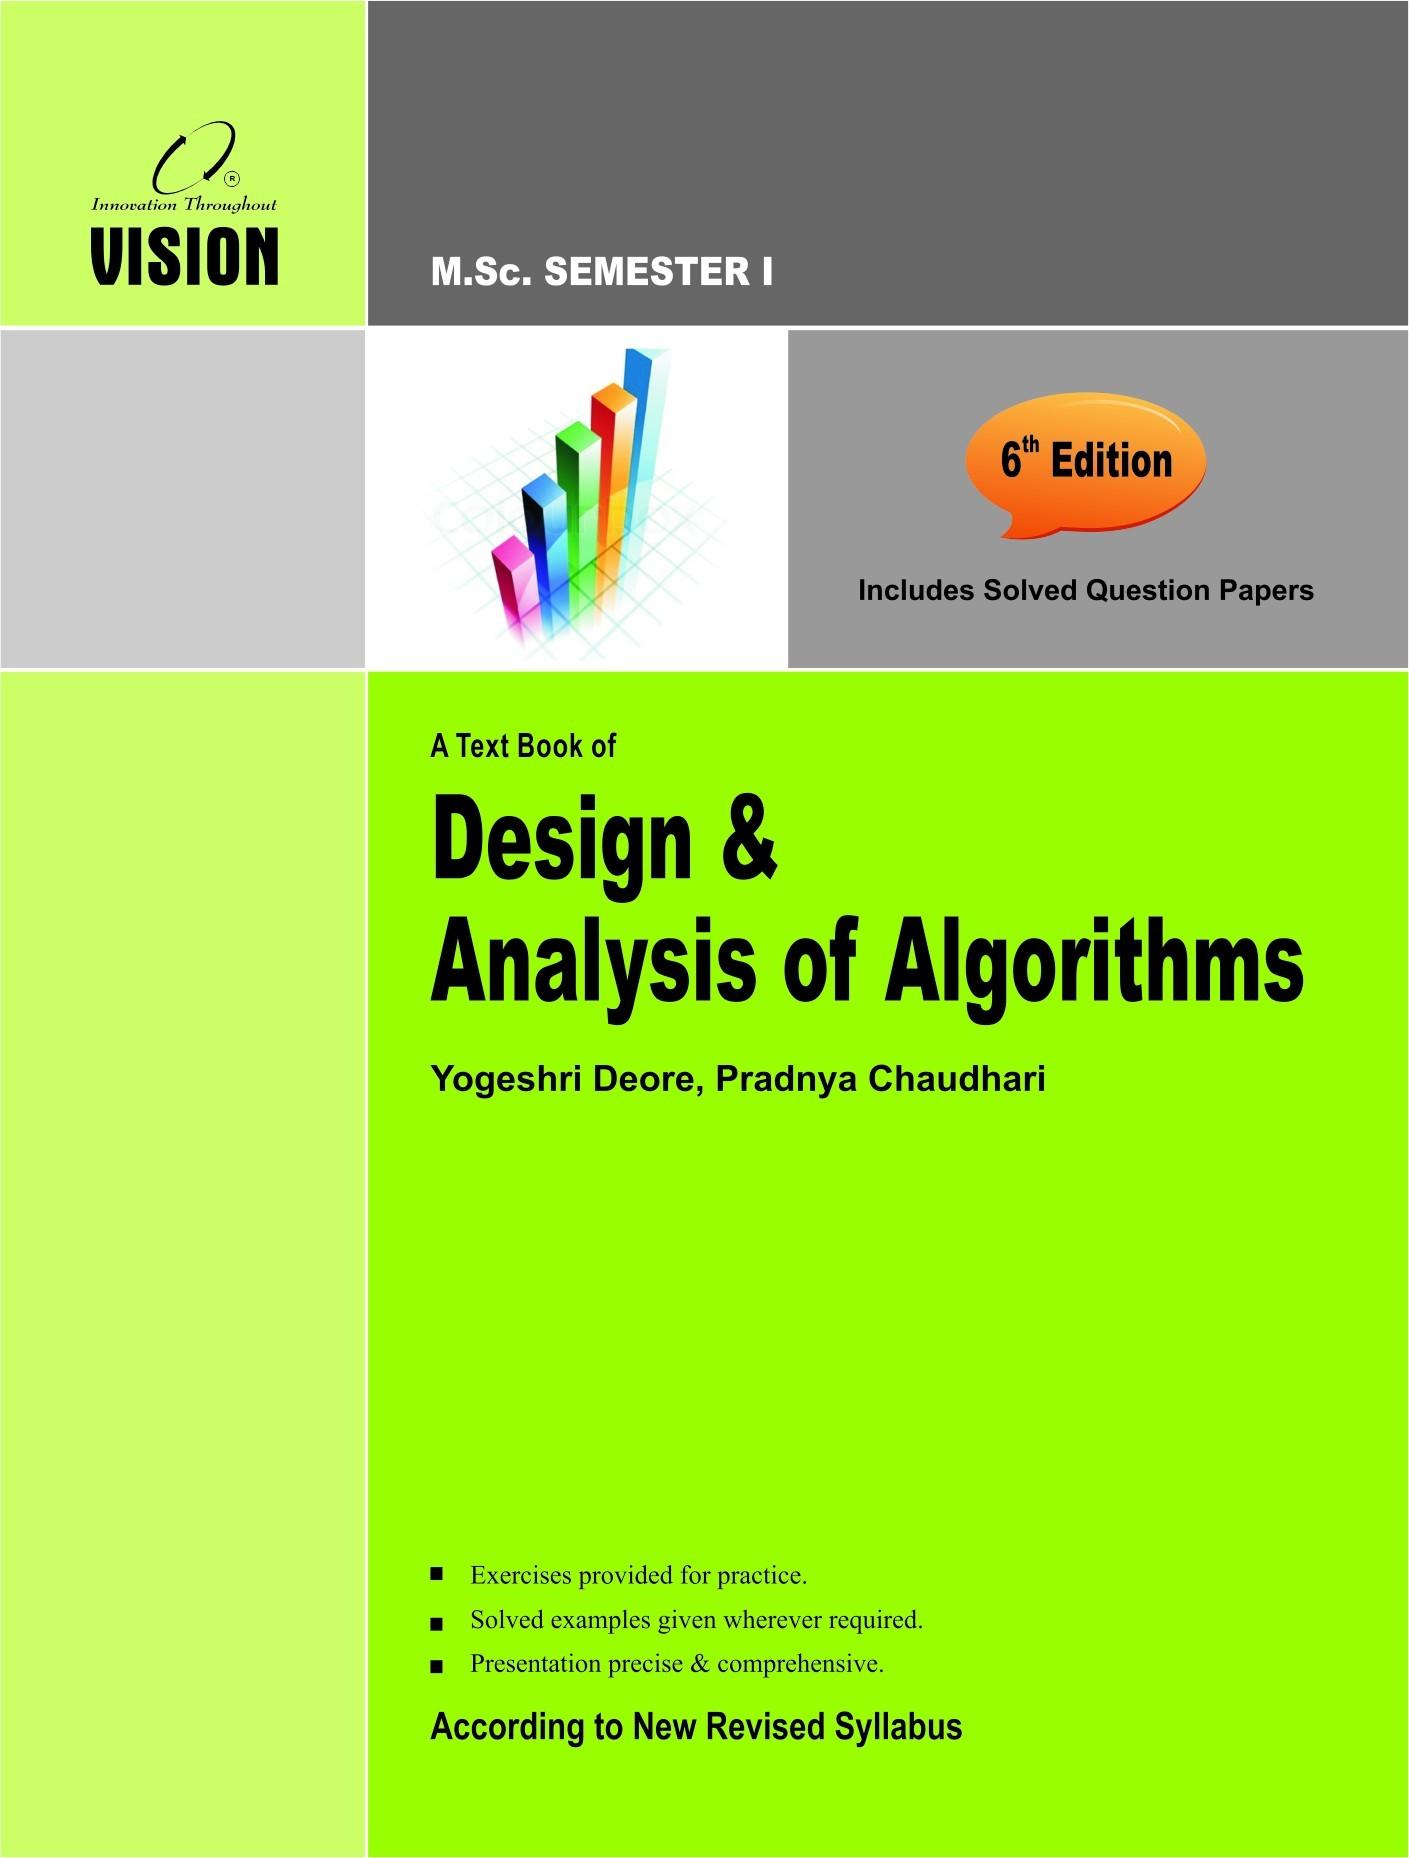 Design & Analysis of Algorithms - Vision Publications